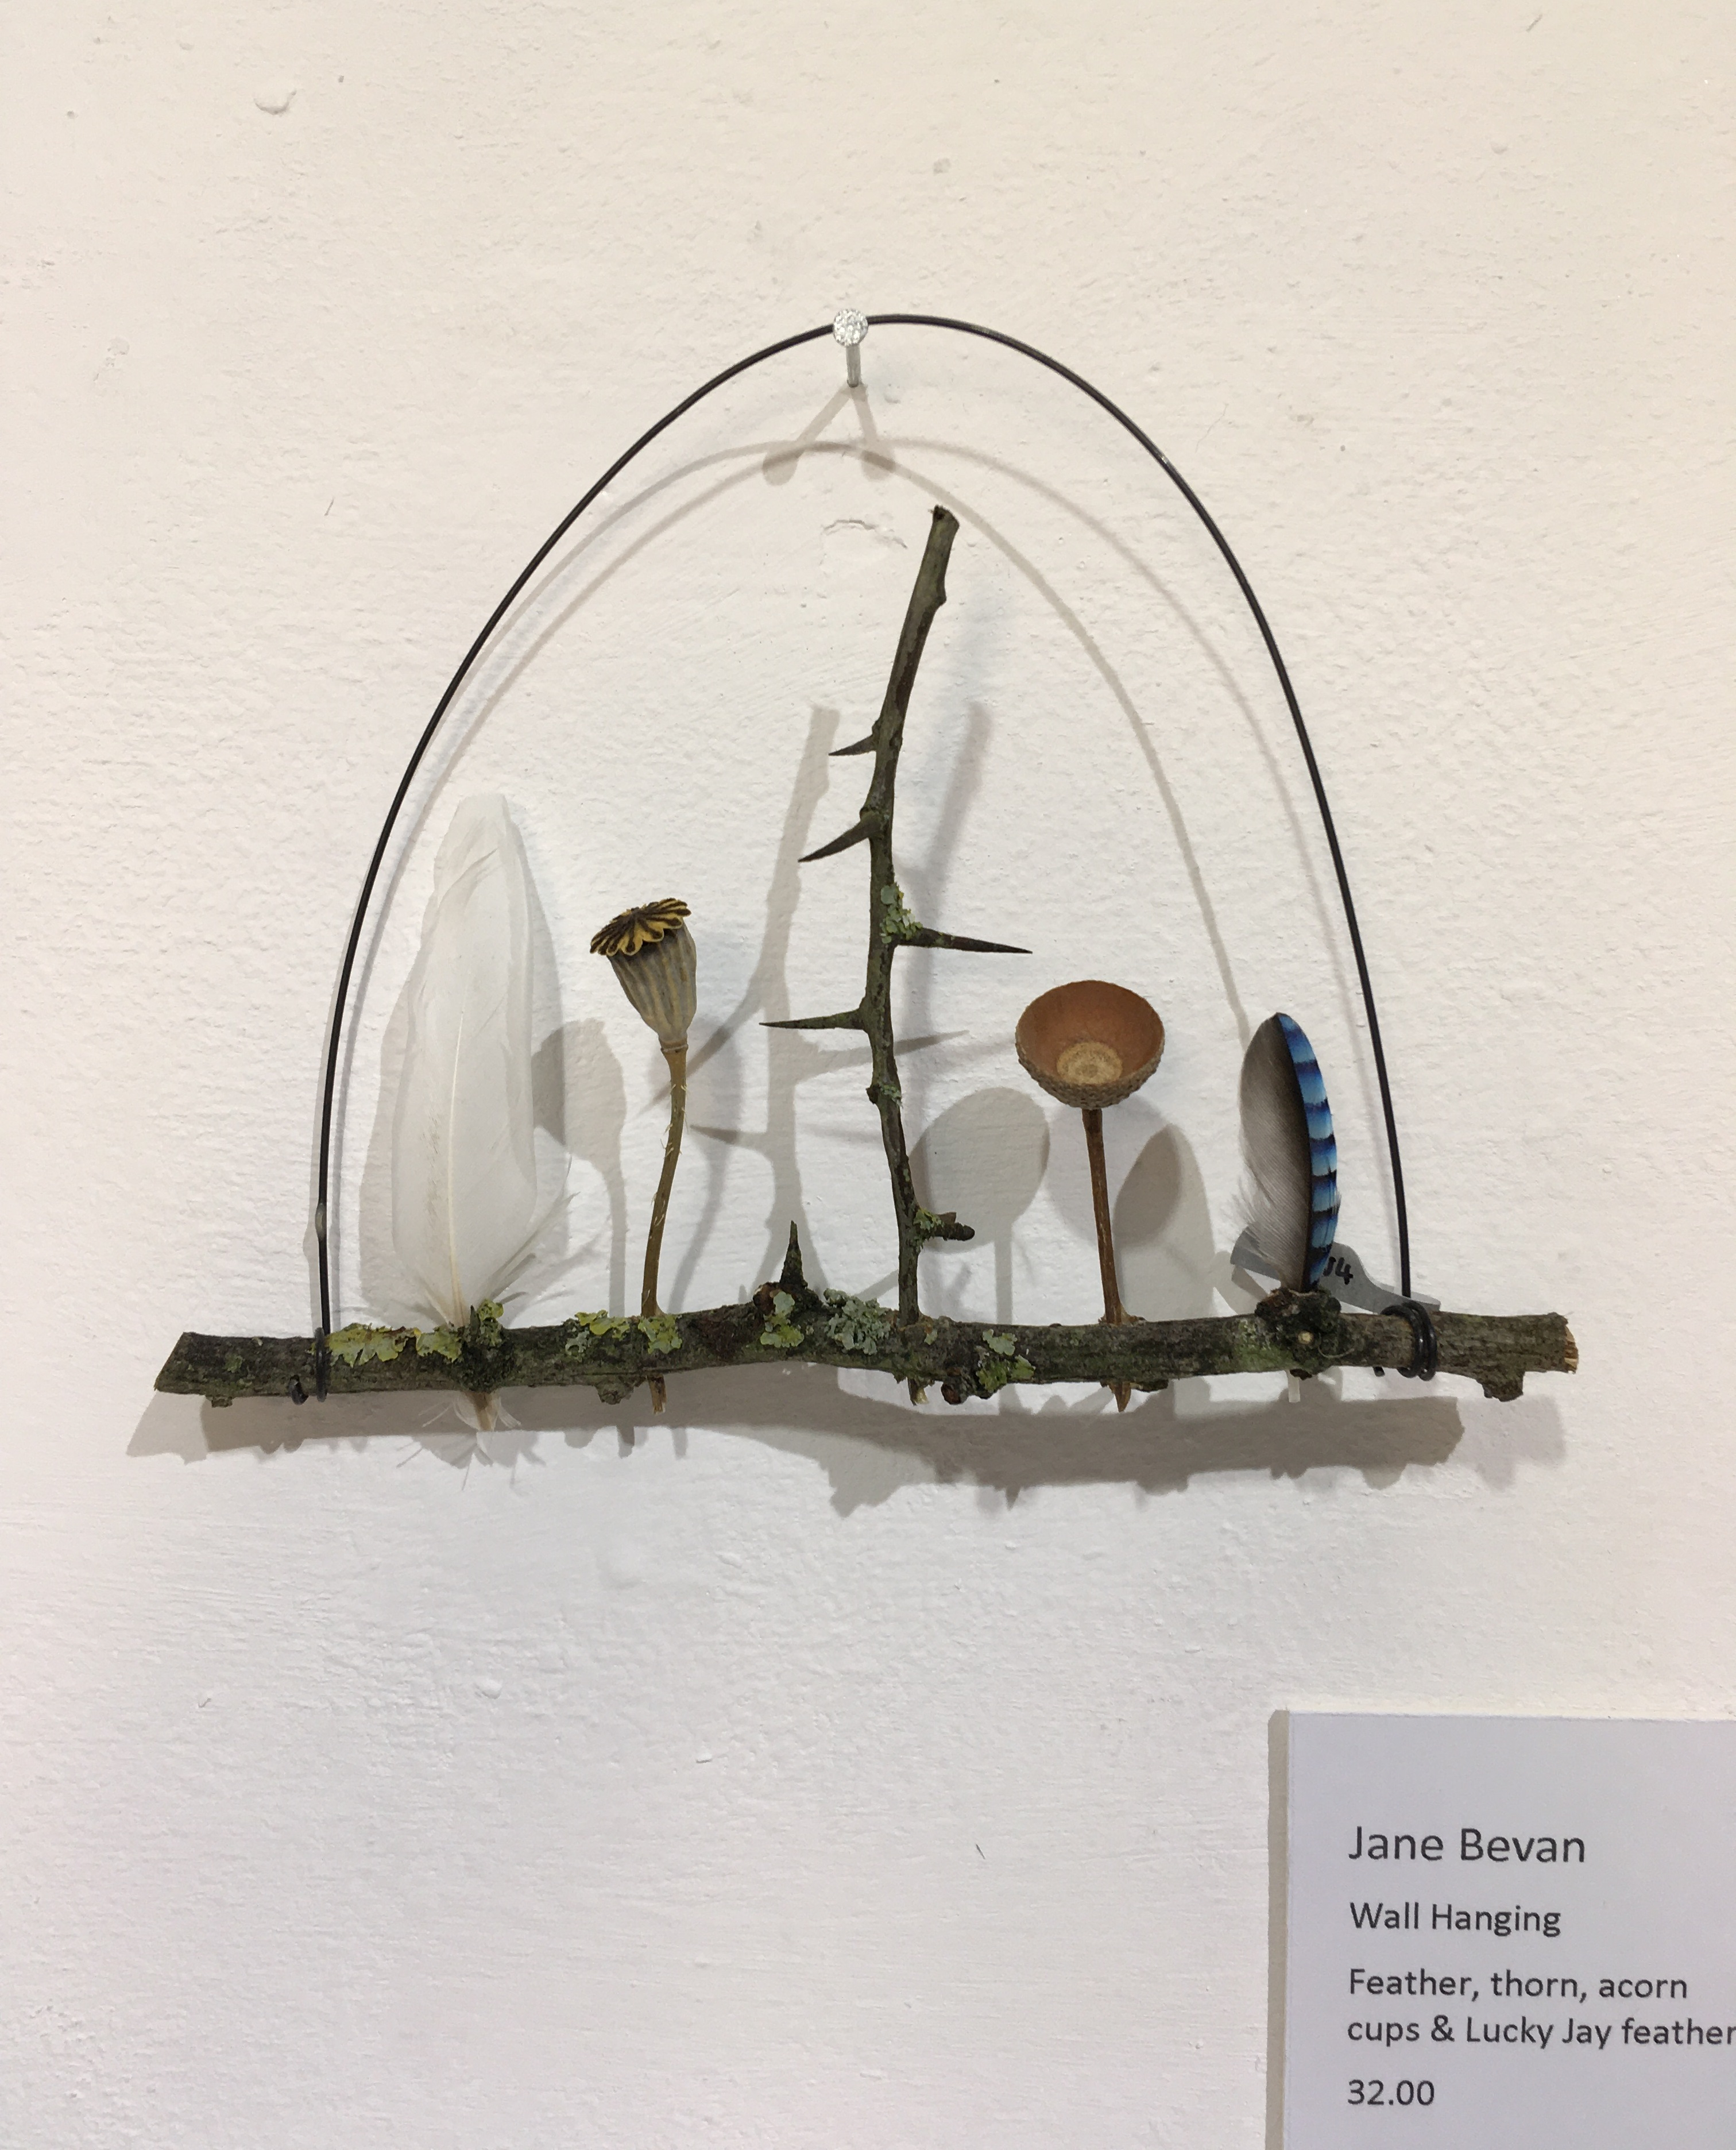 Jane Bevan